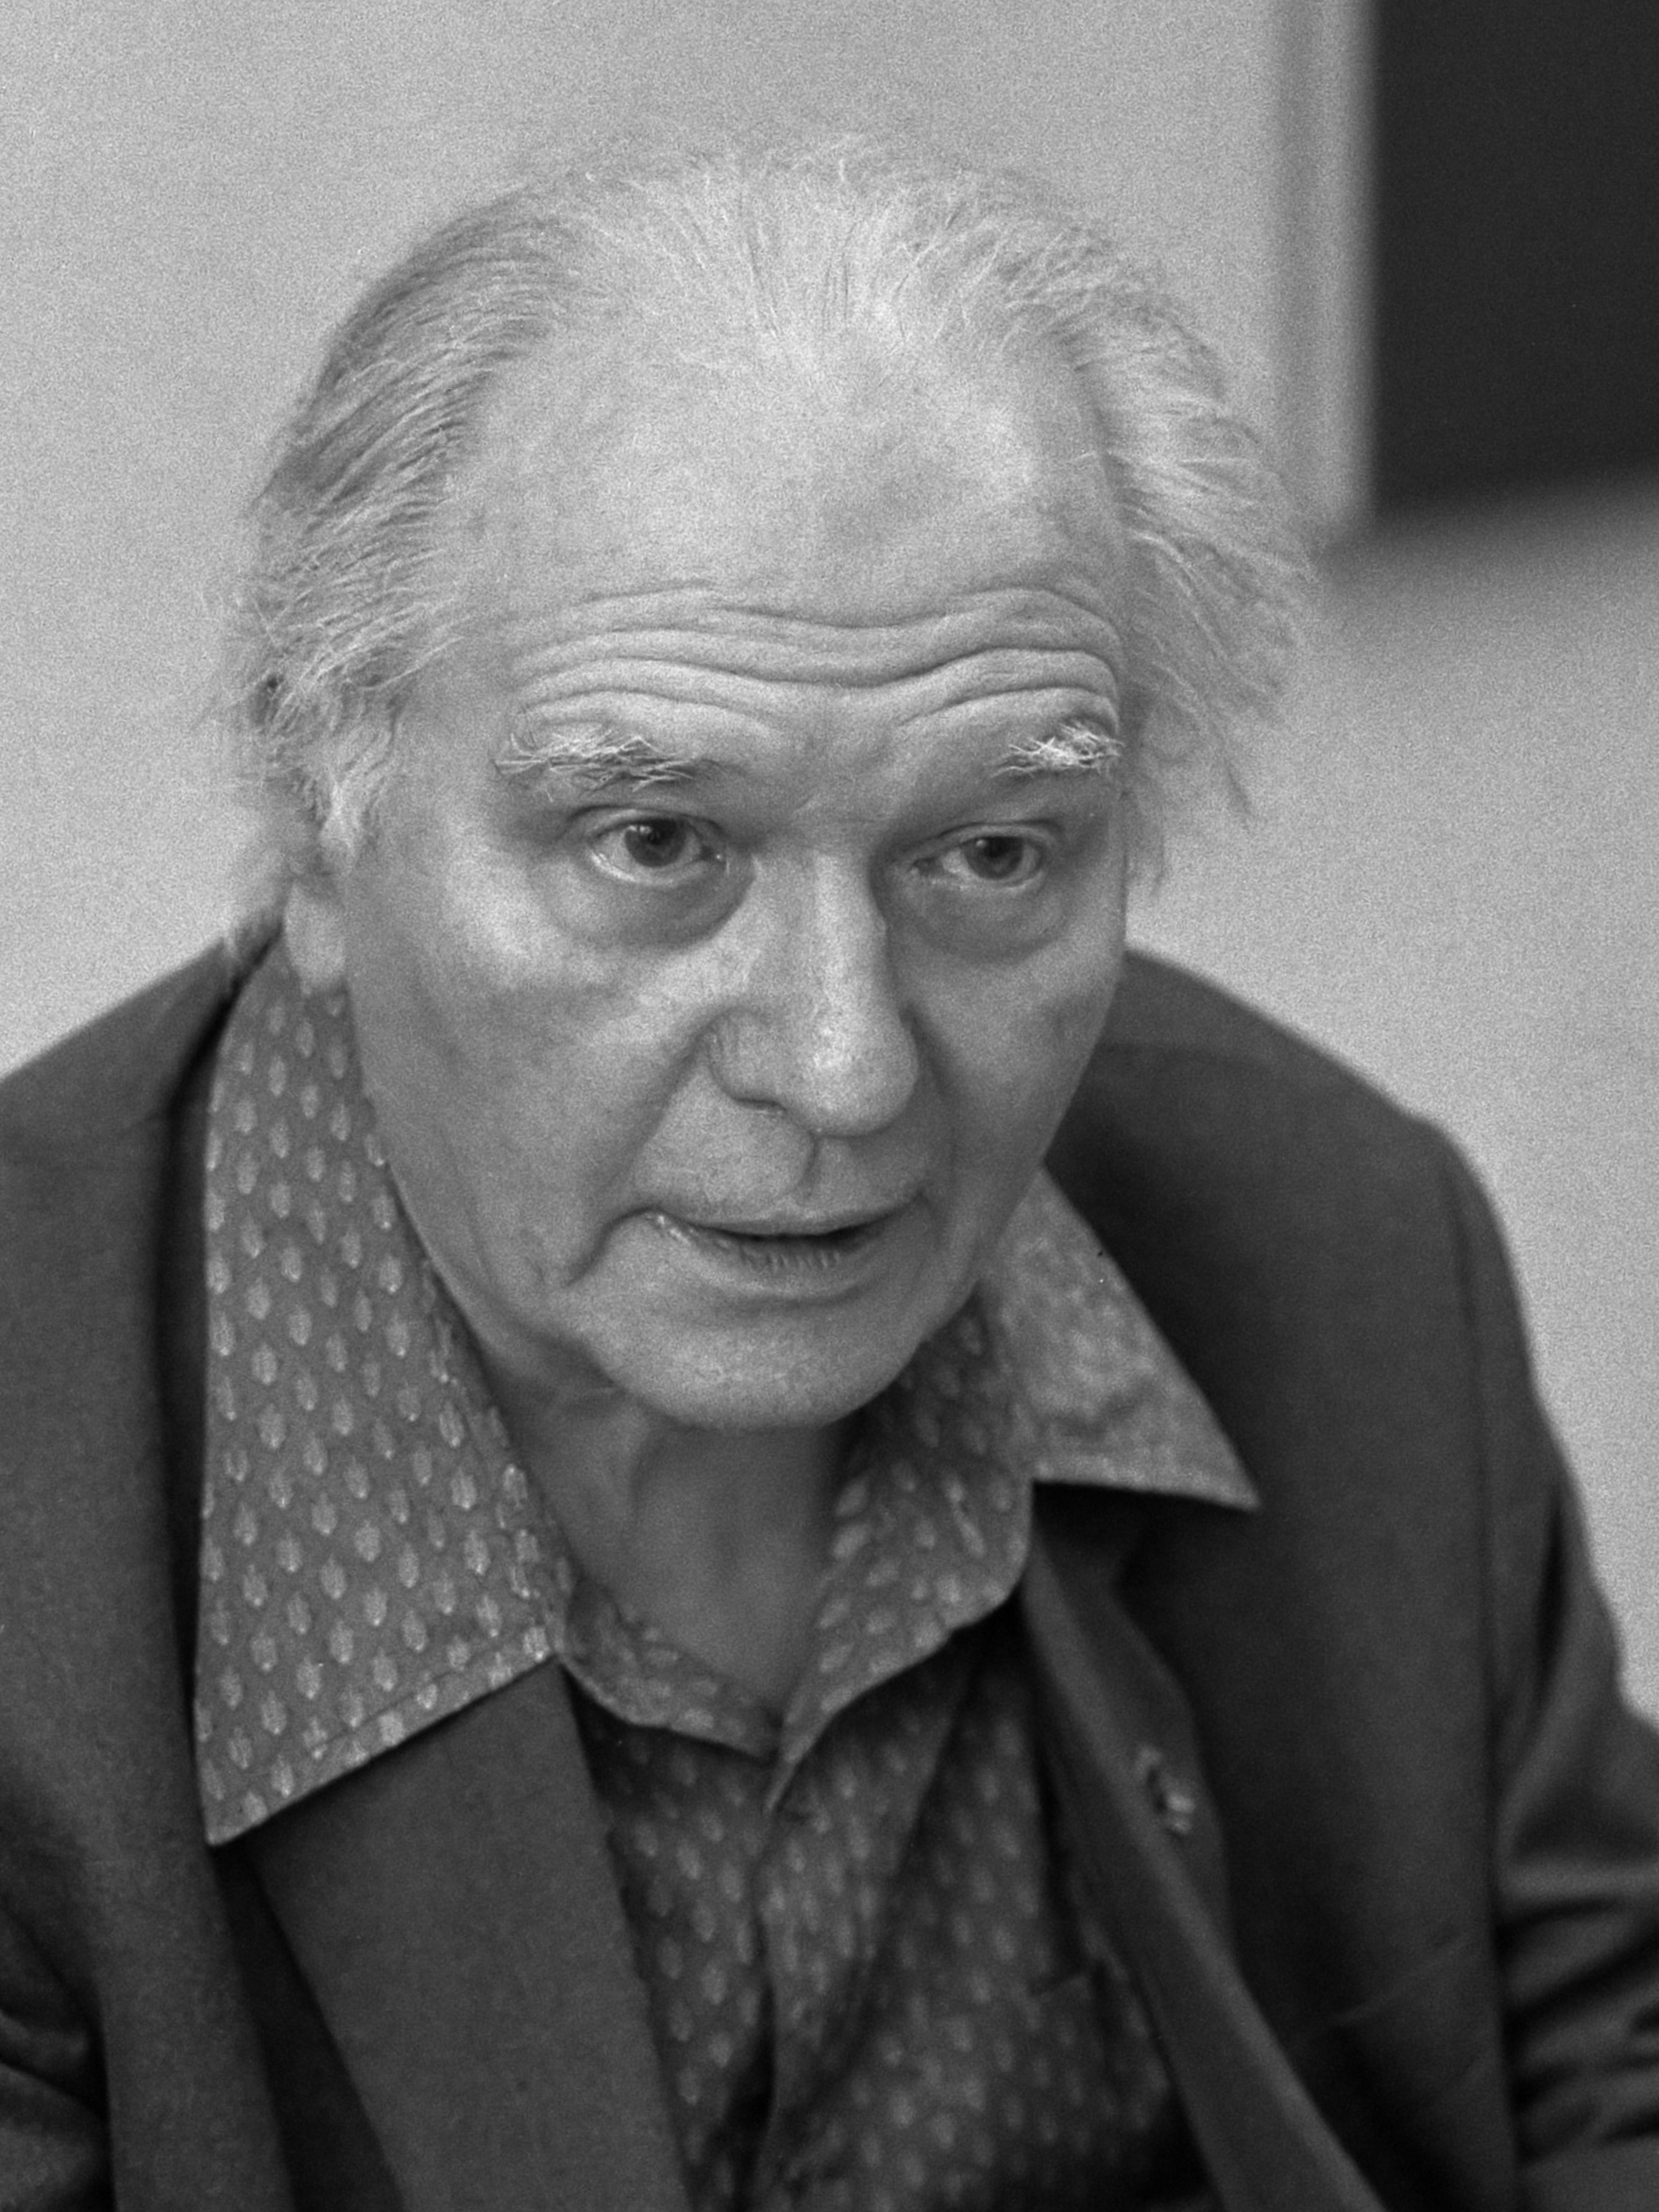 Olivier Messiaen in 1986